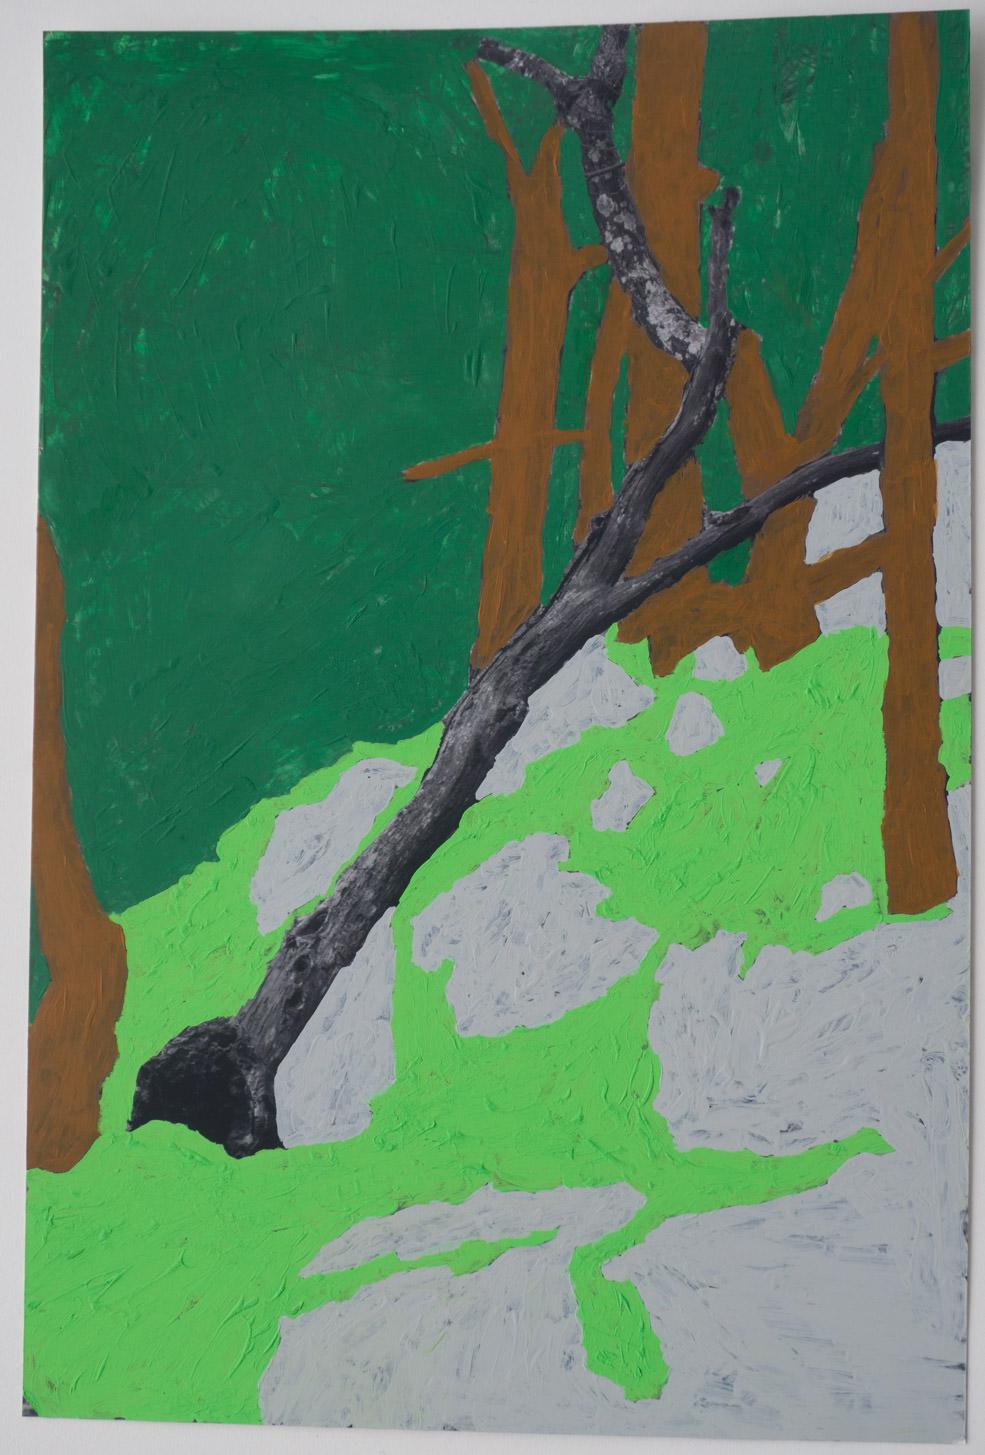 BW Fallen tree  (7x12 - print - acrylic